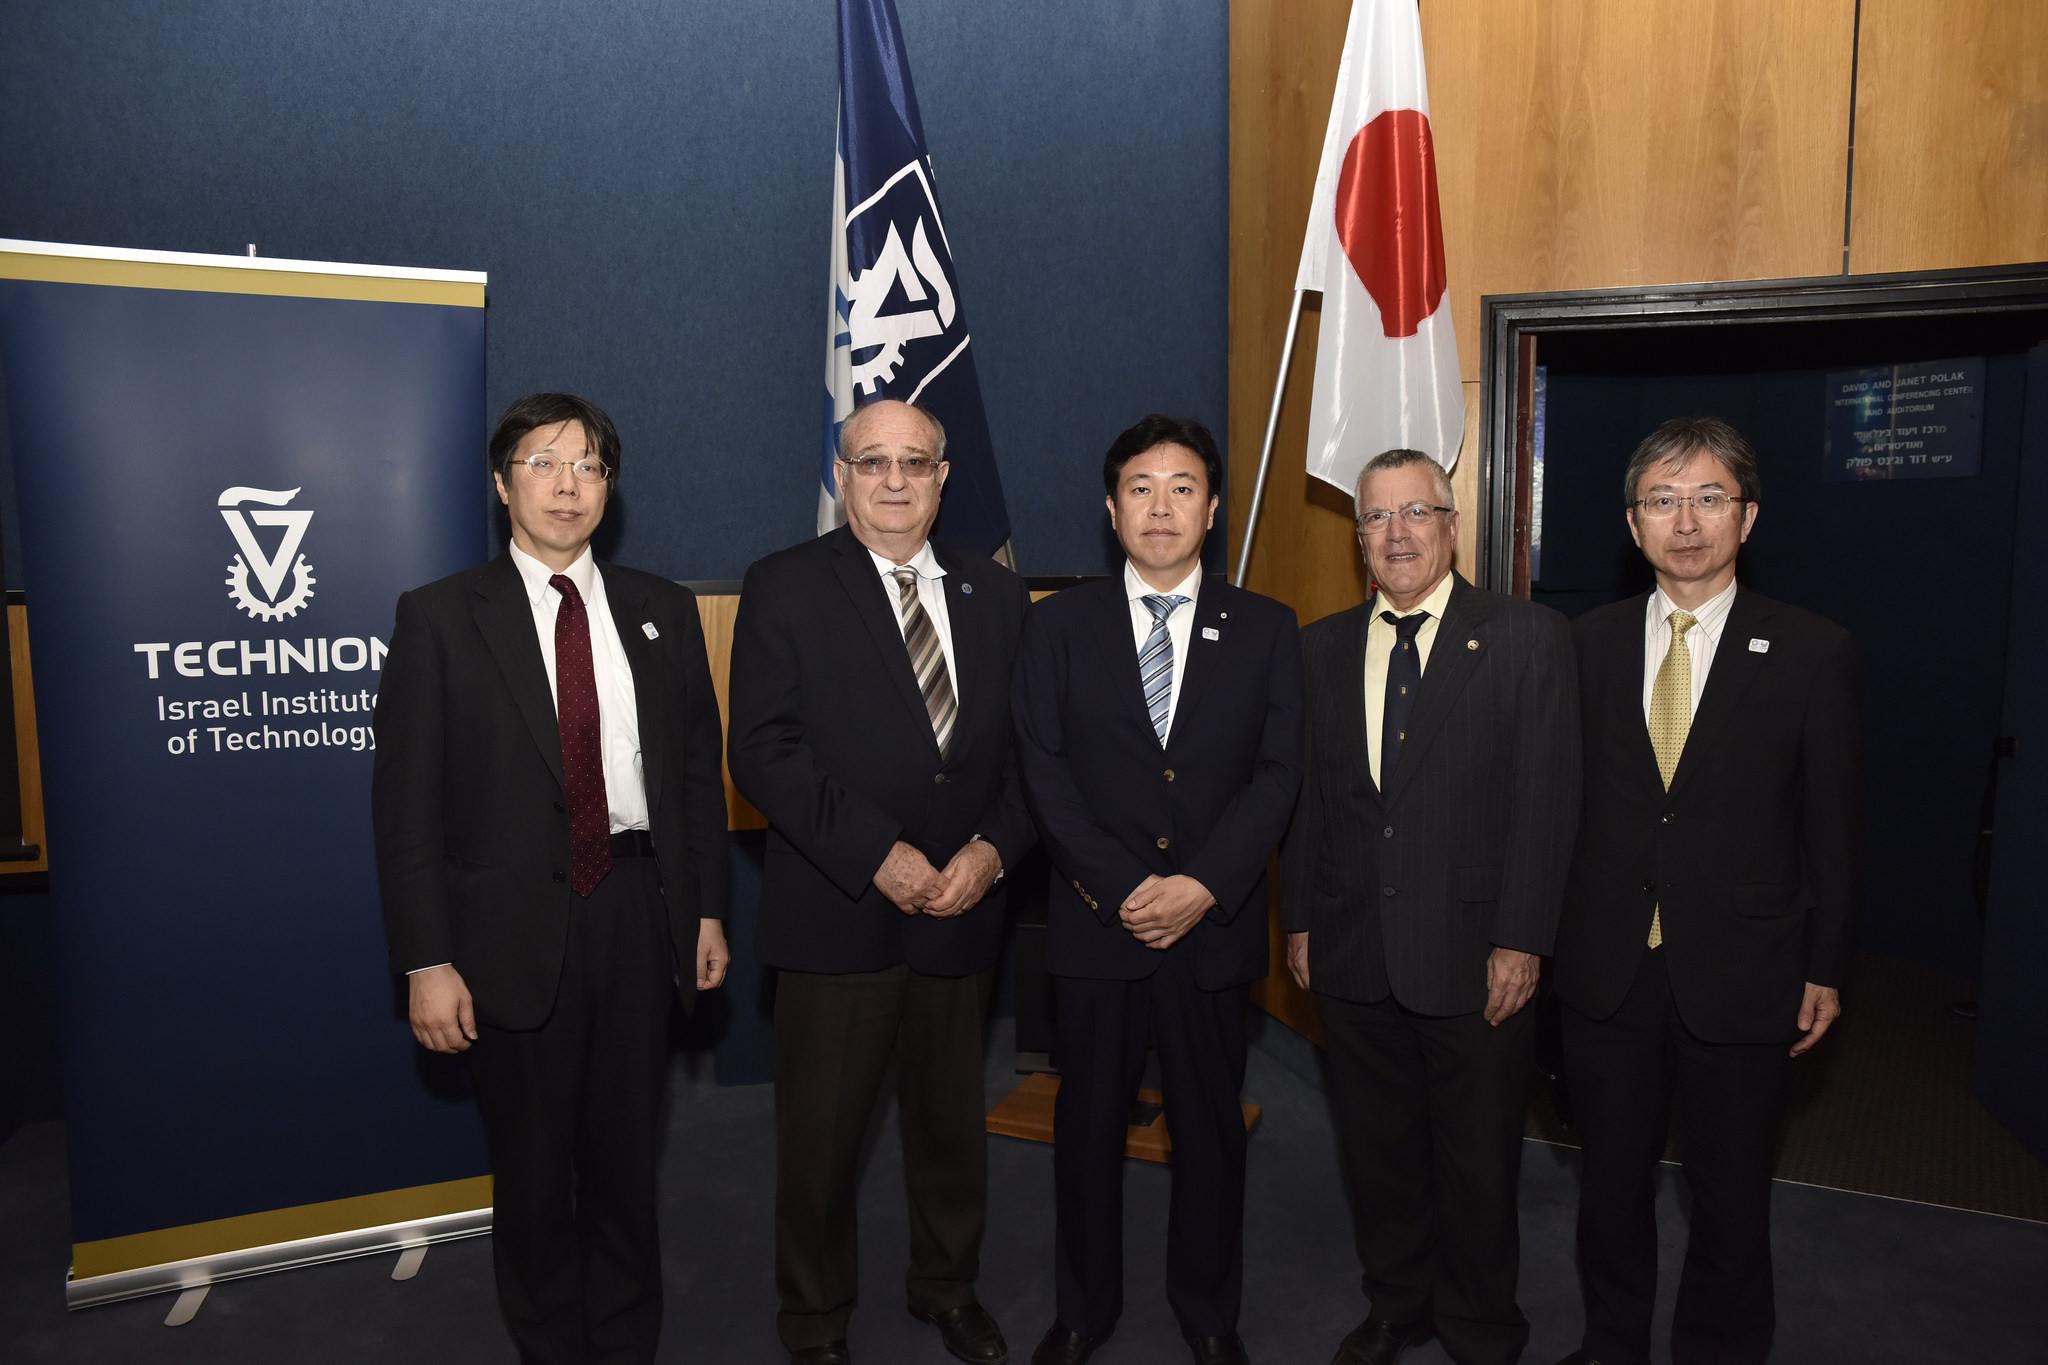 Руководители Техниона с японскими гостями. Фото: Шарон Цур